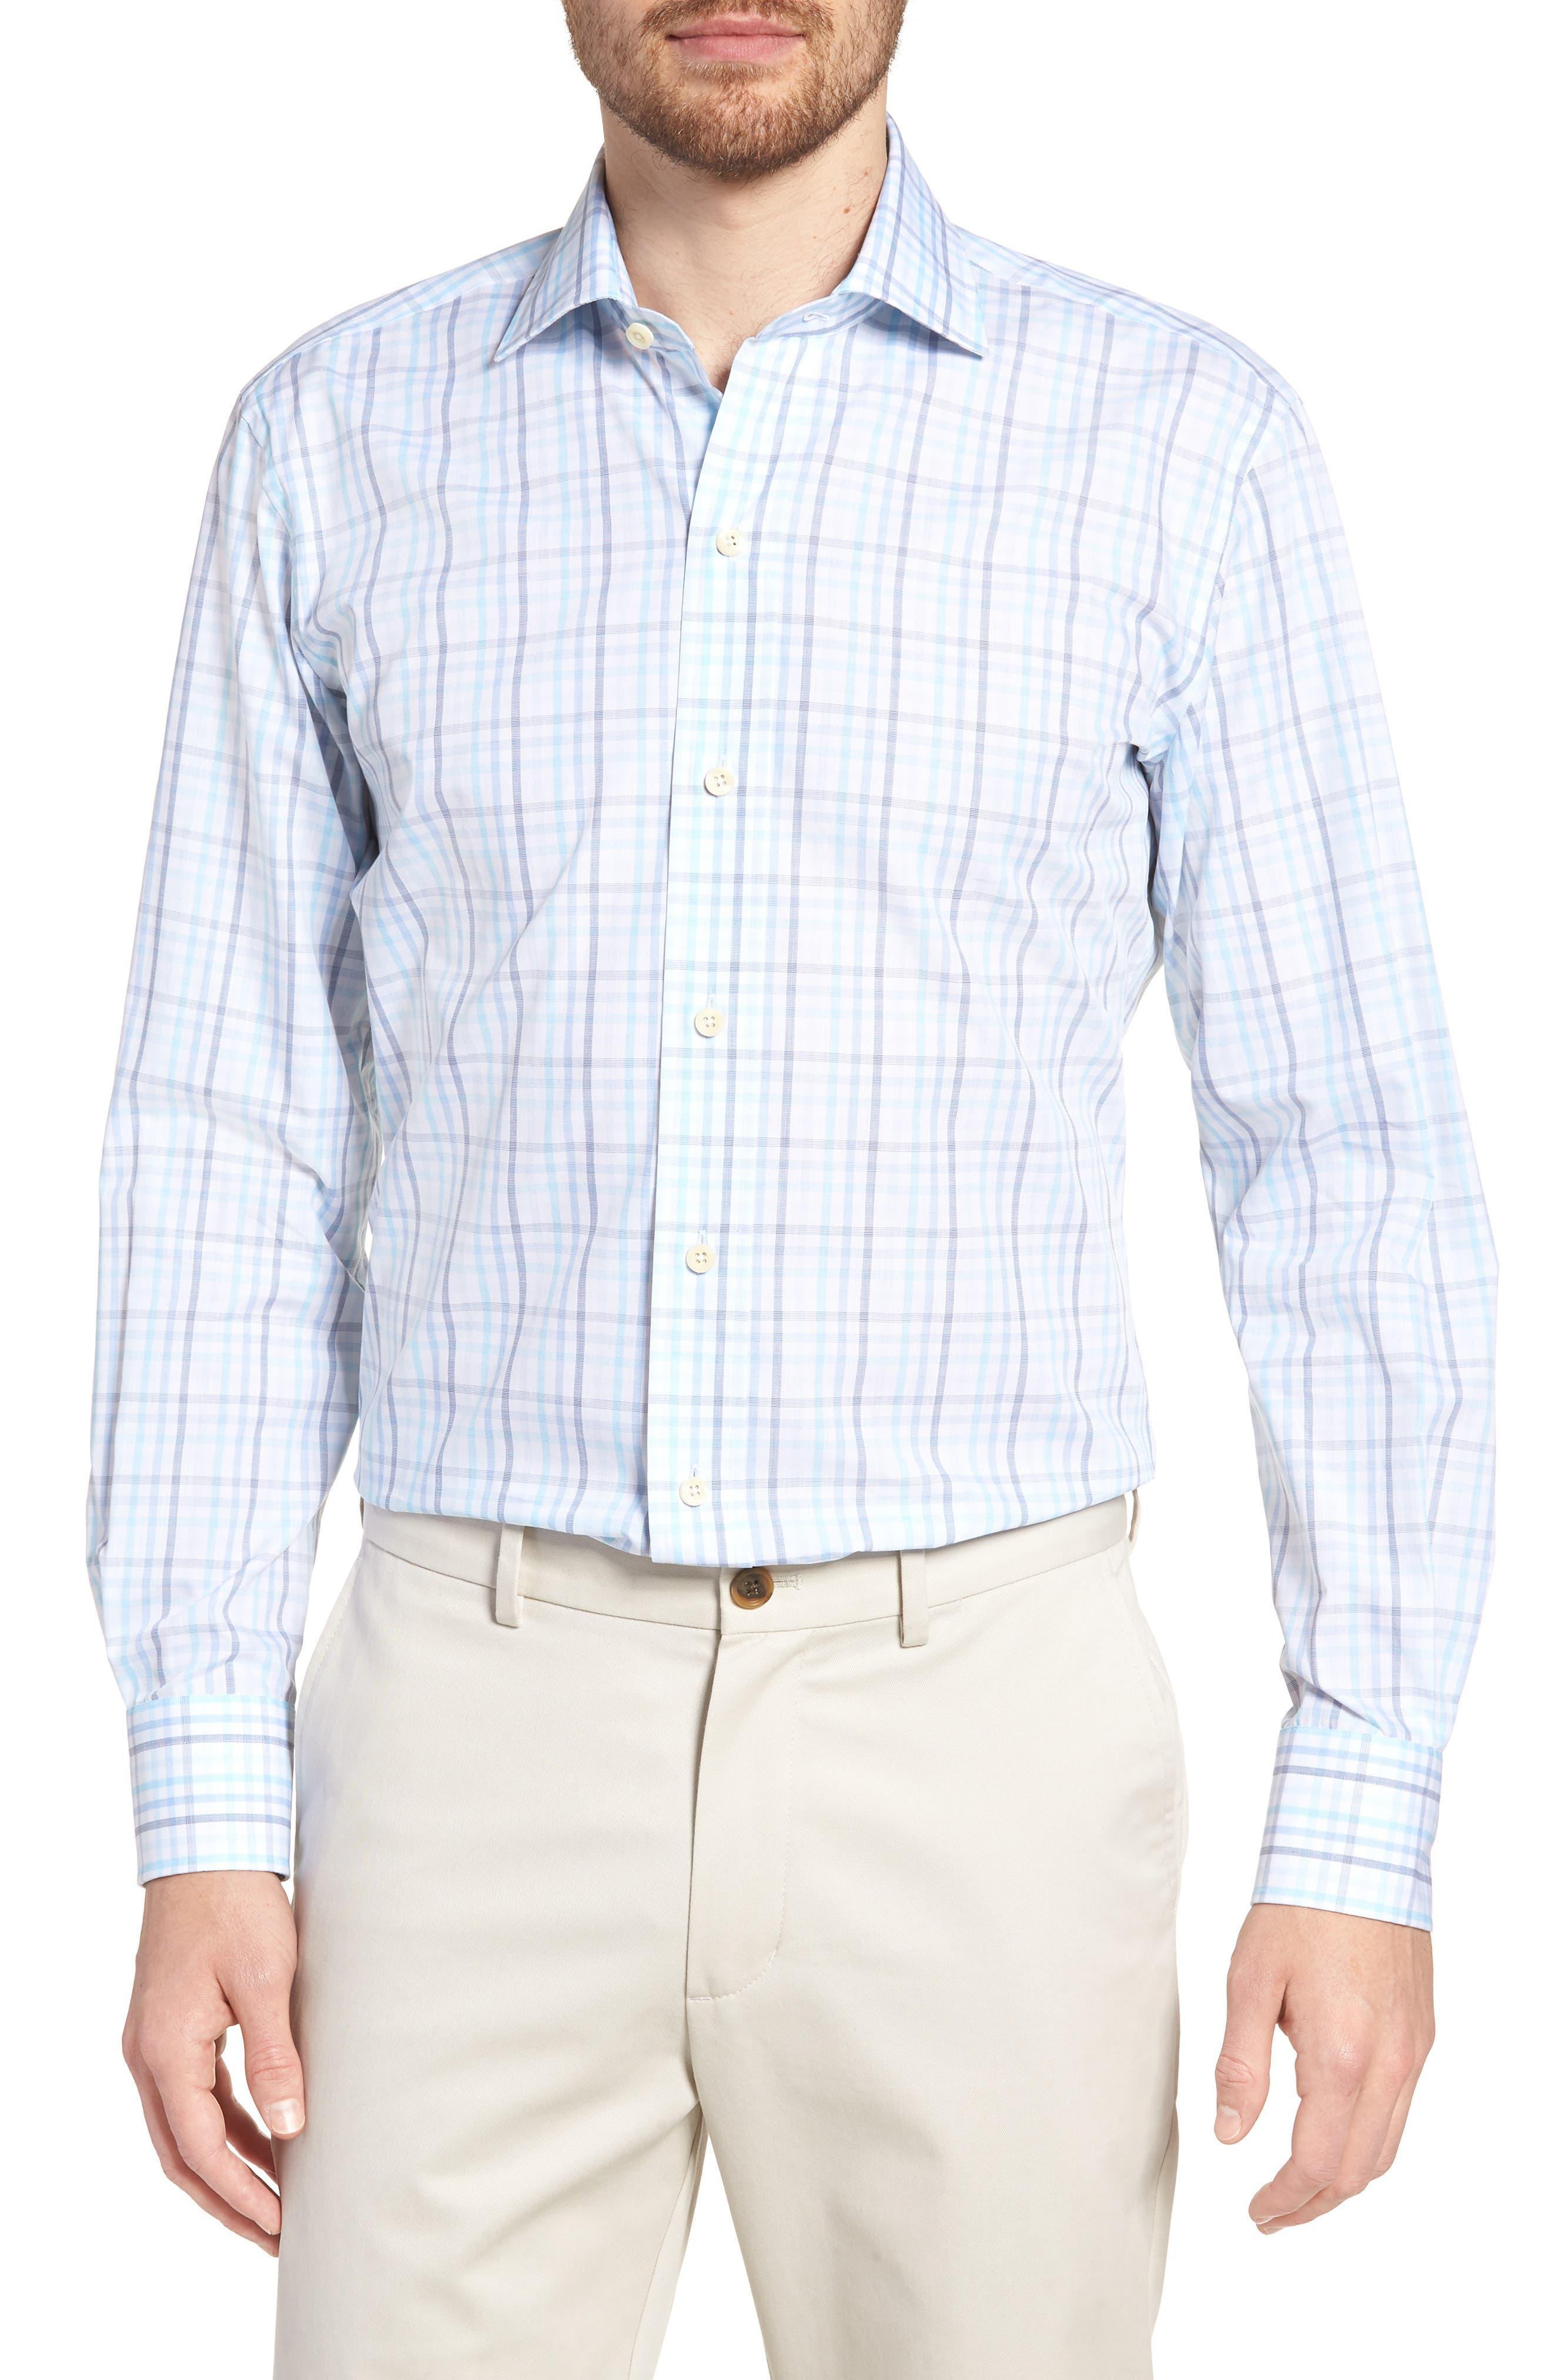 Pelton Slim Fit Check Dress Shirt,                         Main,                         color, Turquoise/ Aqua